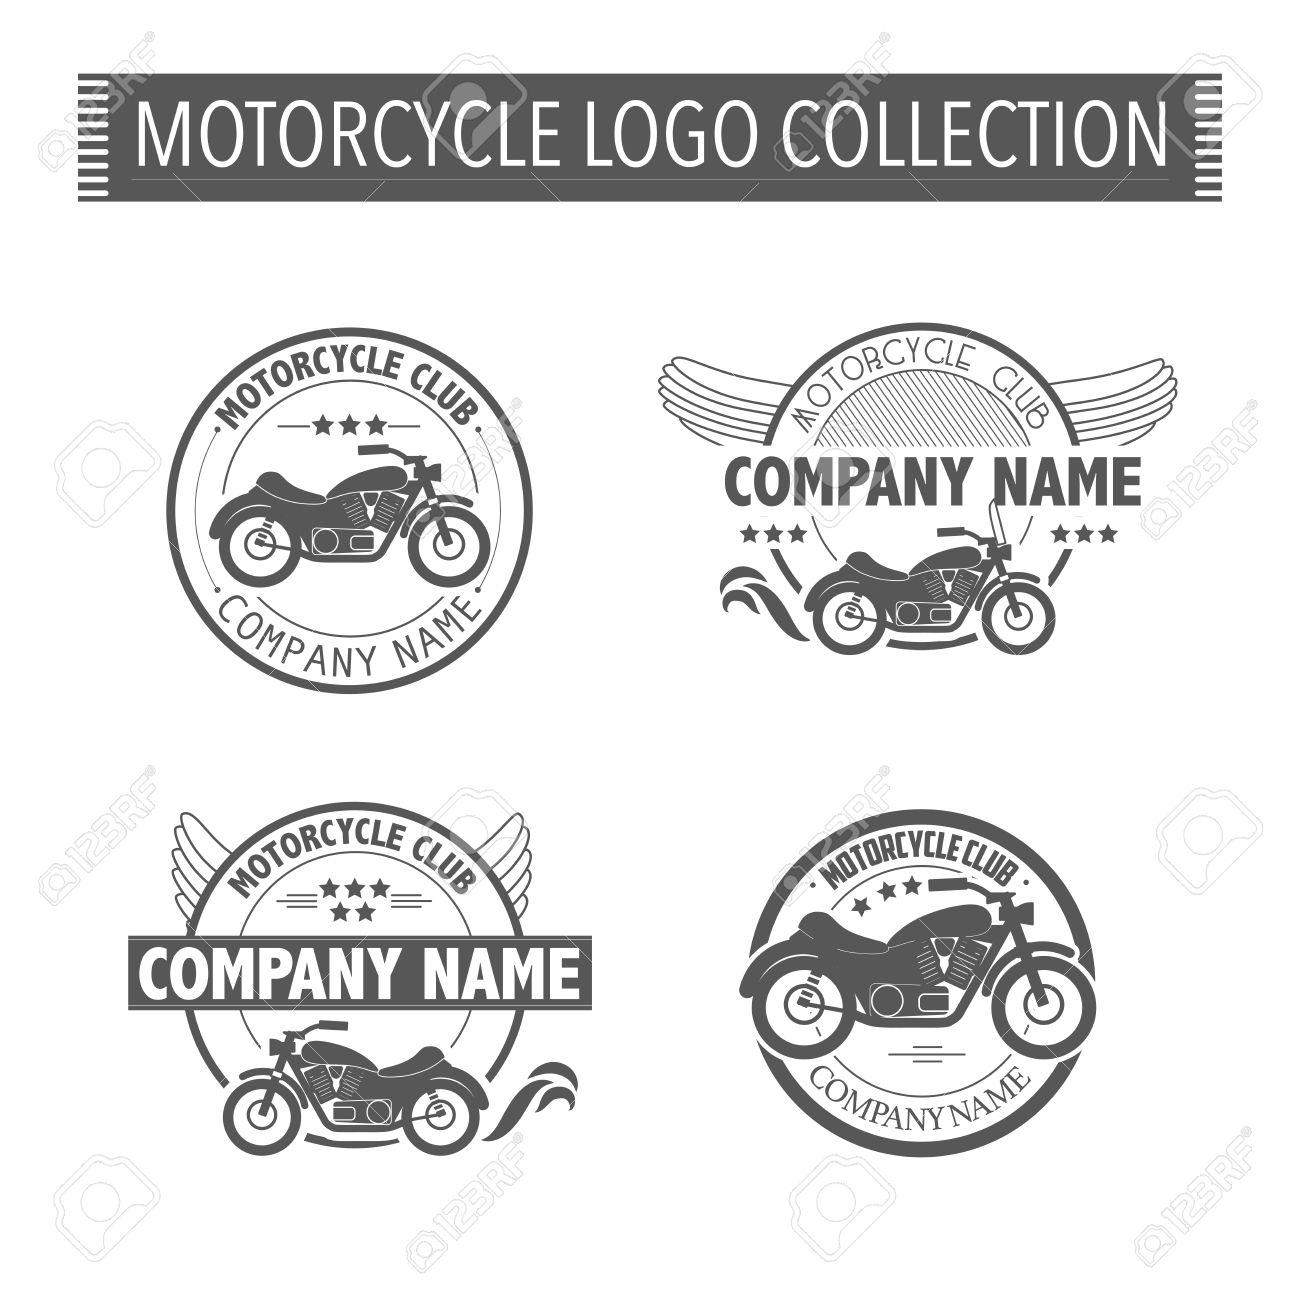 Vector Motorcycle Club Logo Template. Royalty Free Cliparts, Vectors ...